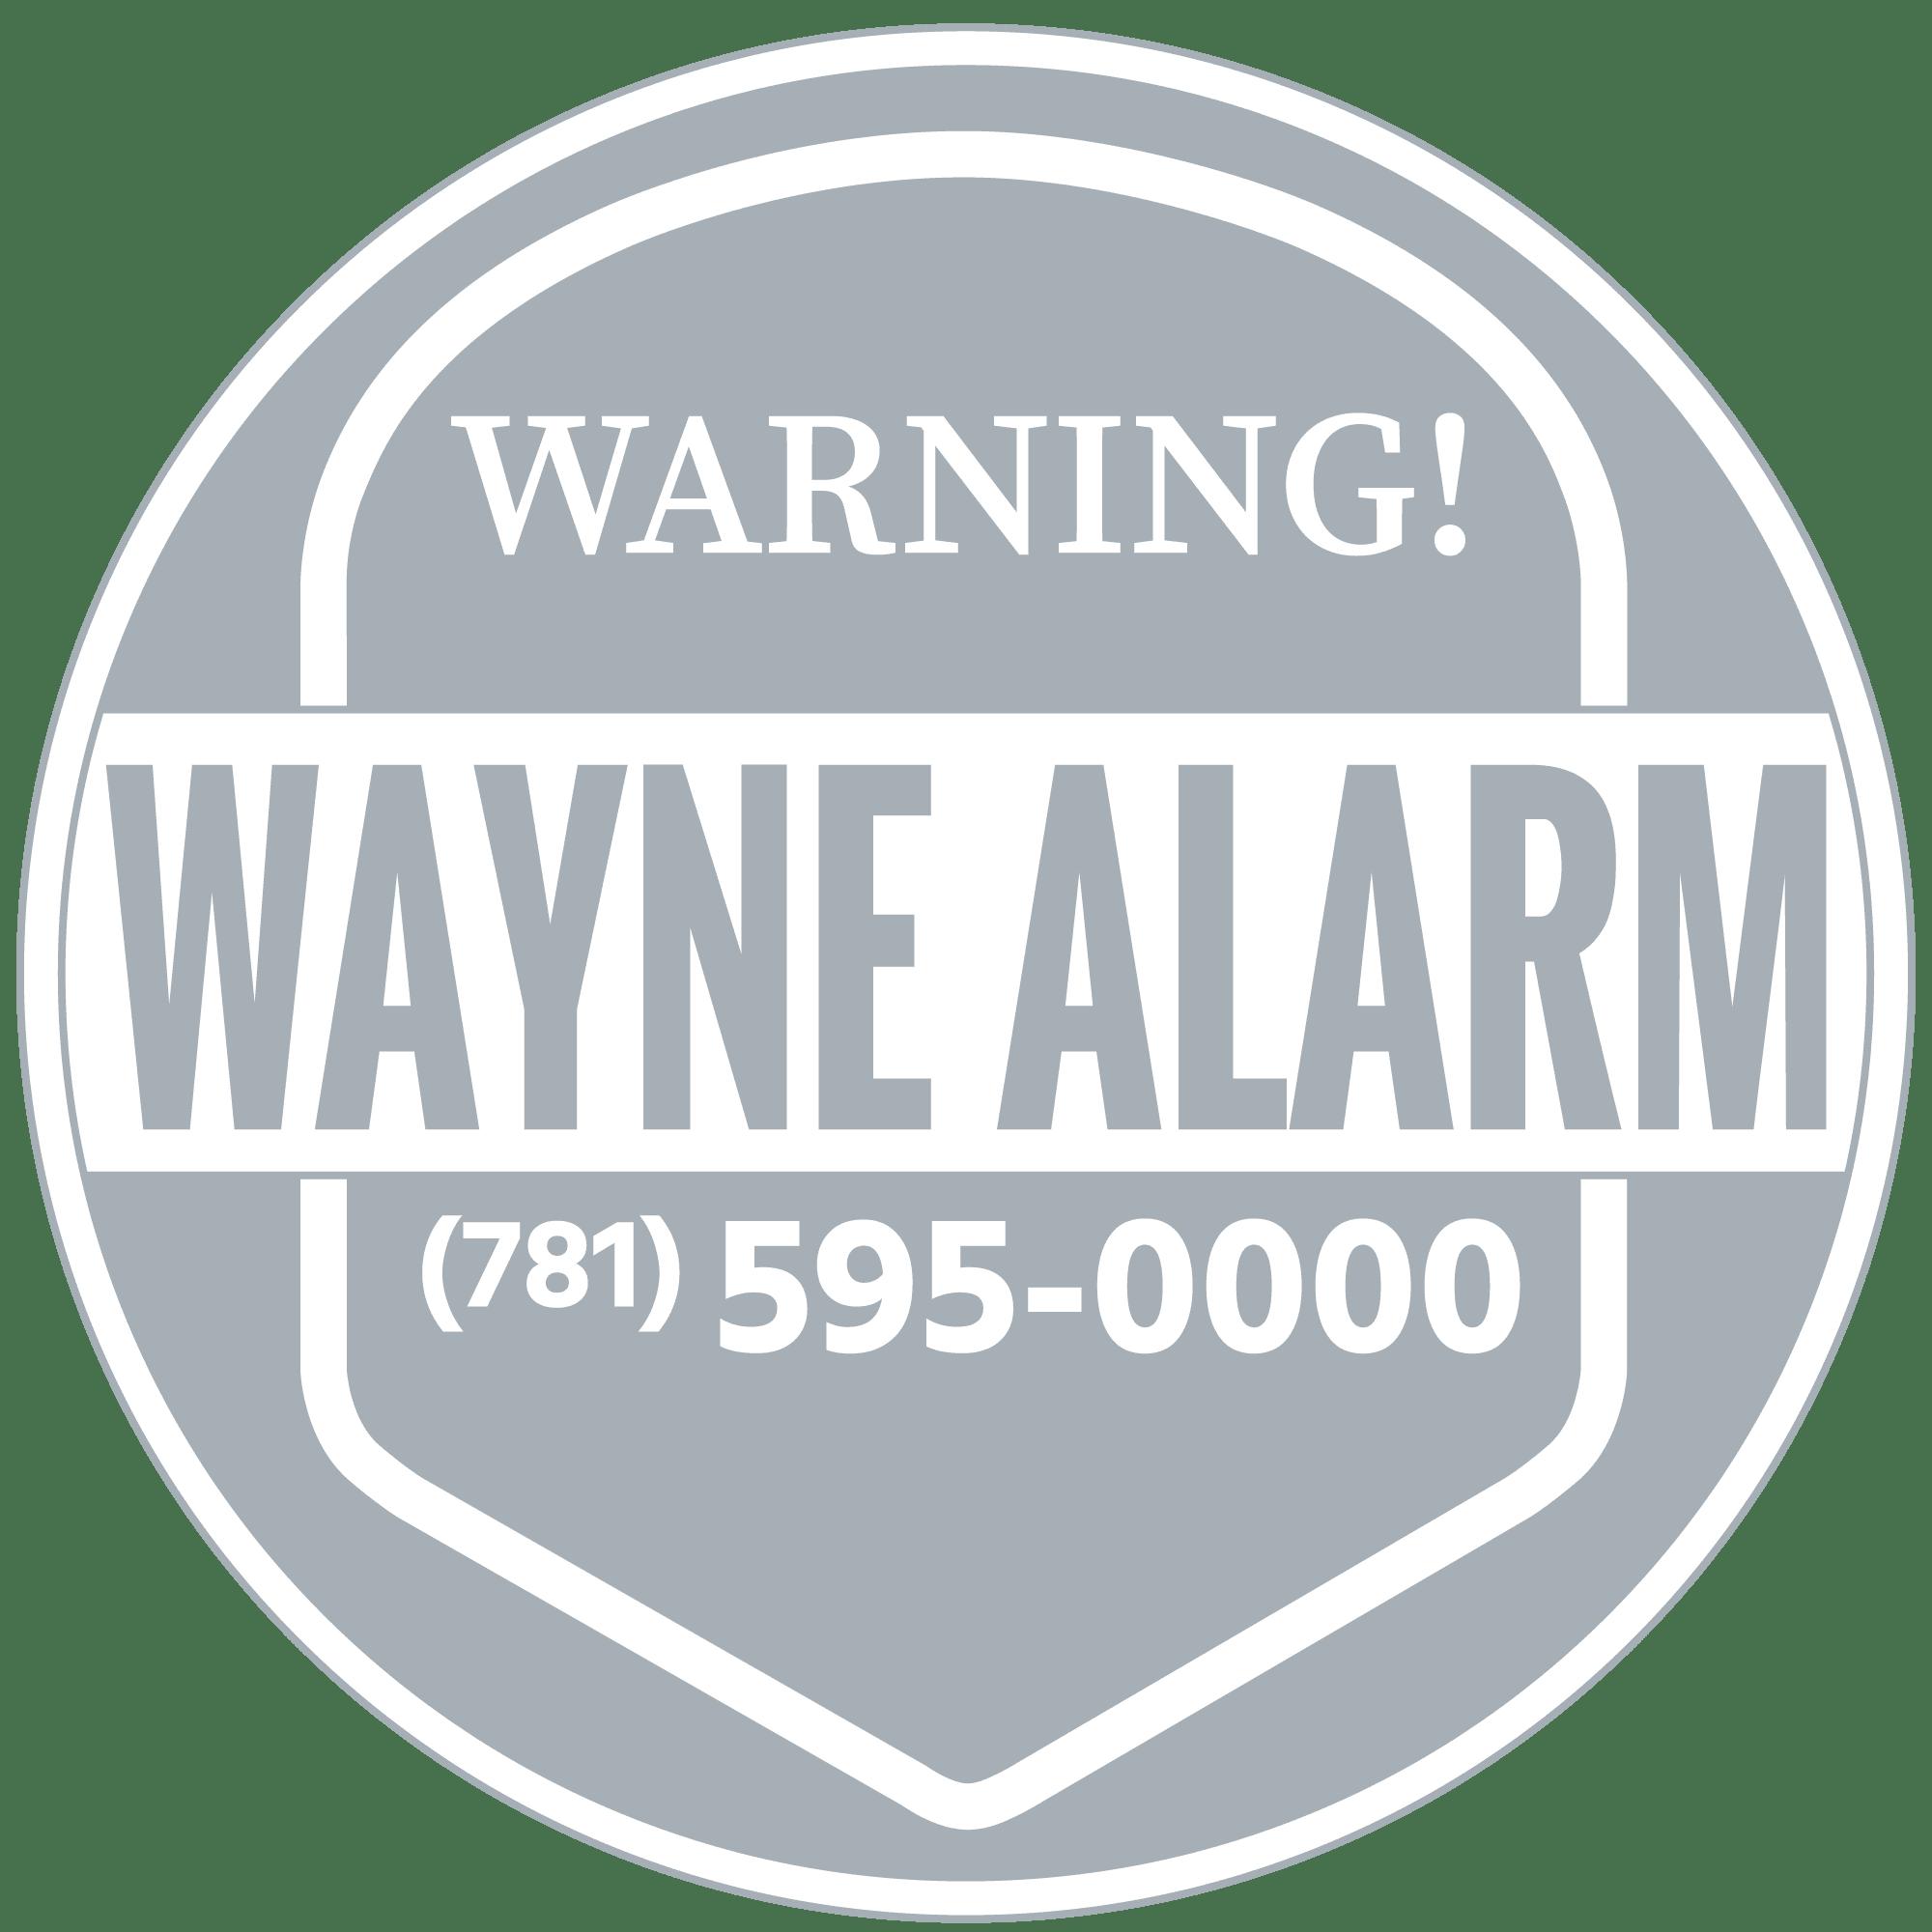 Wayne Alarm